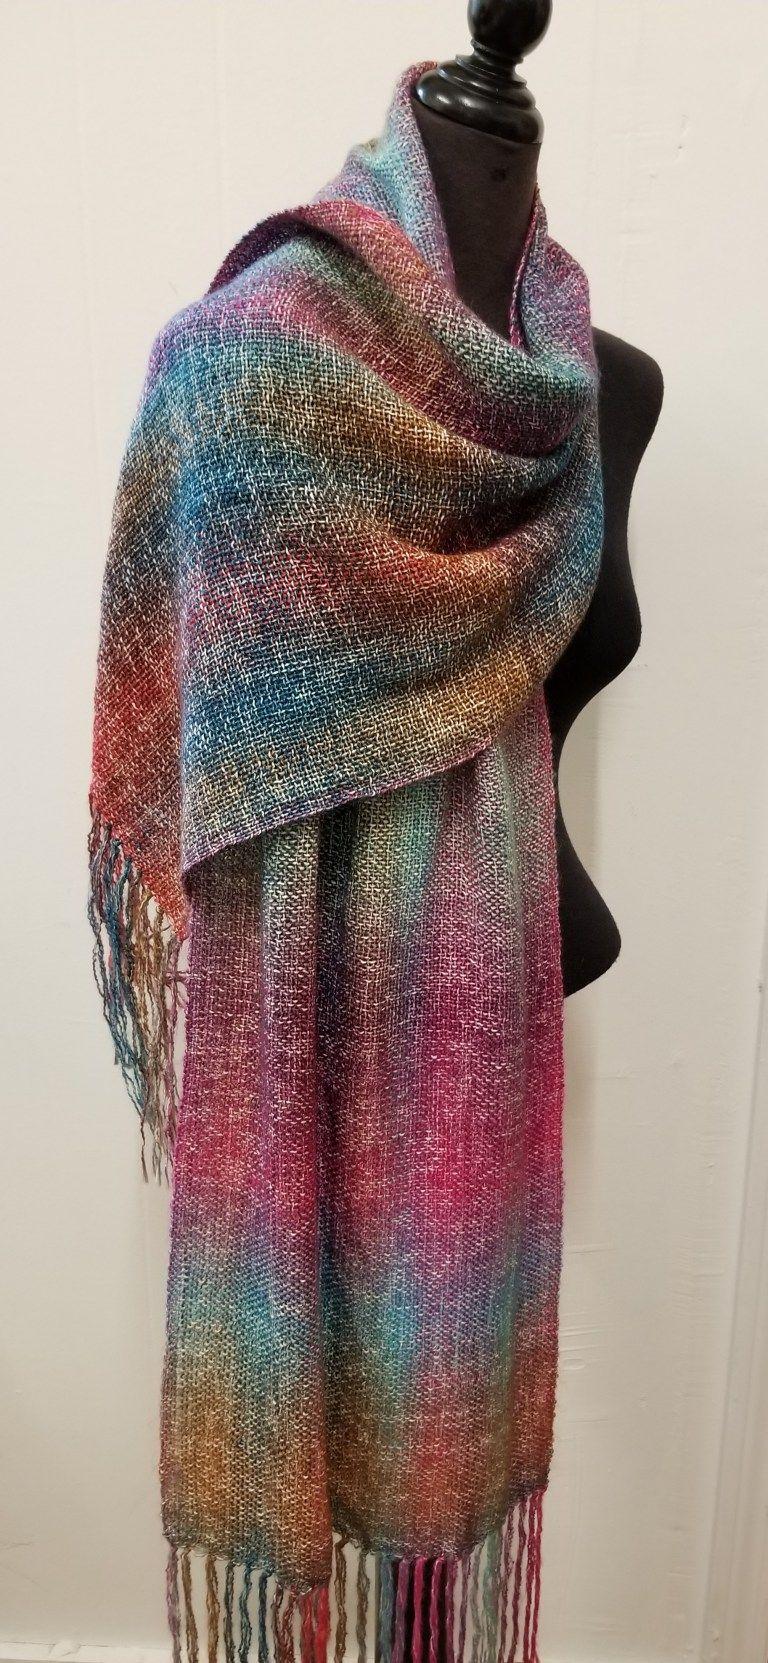 Woven Rainbow Shawls